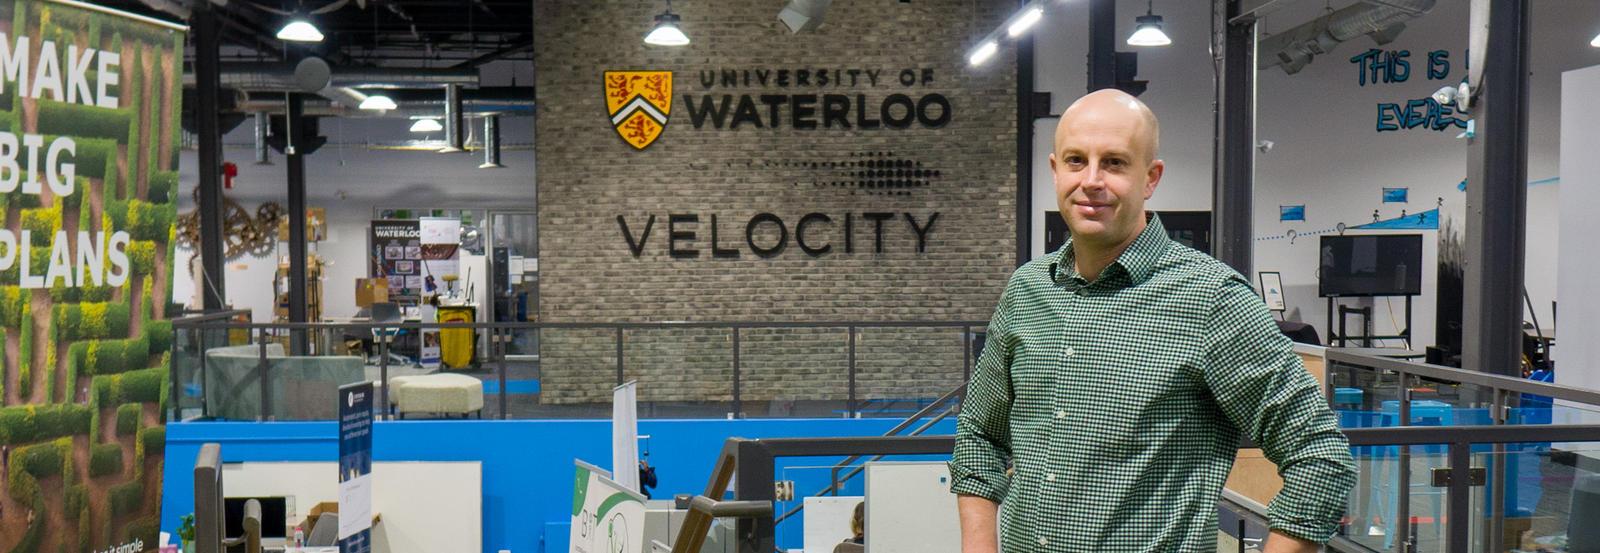 Adrien Cote in Velocity building